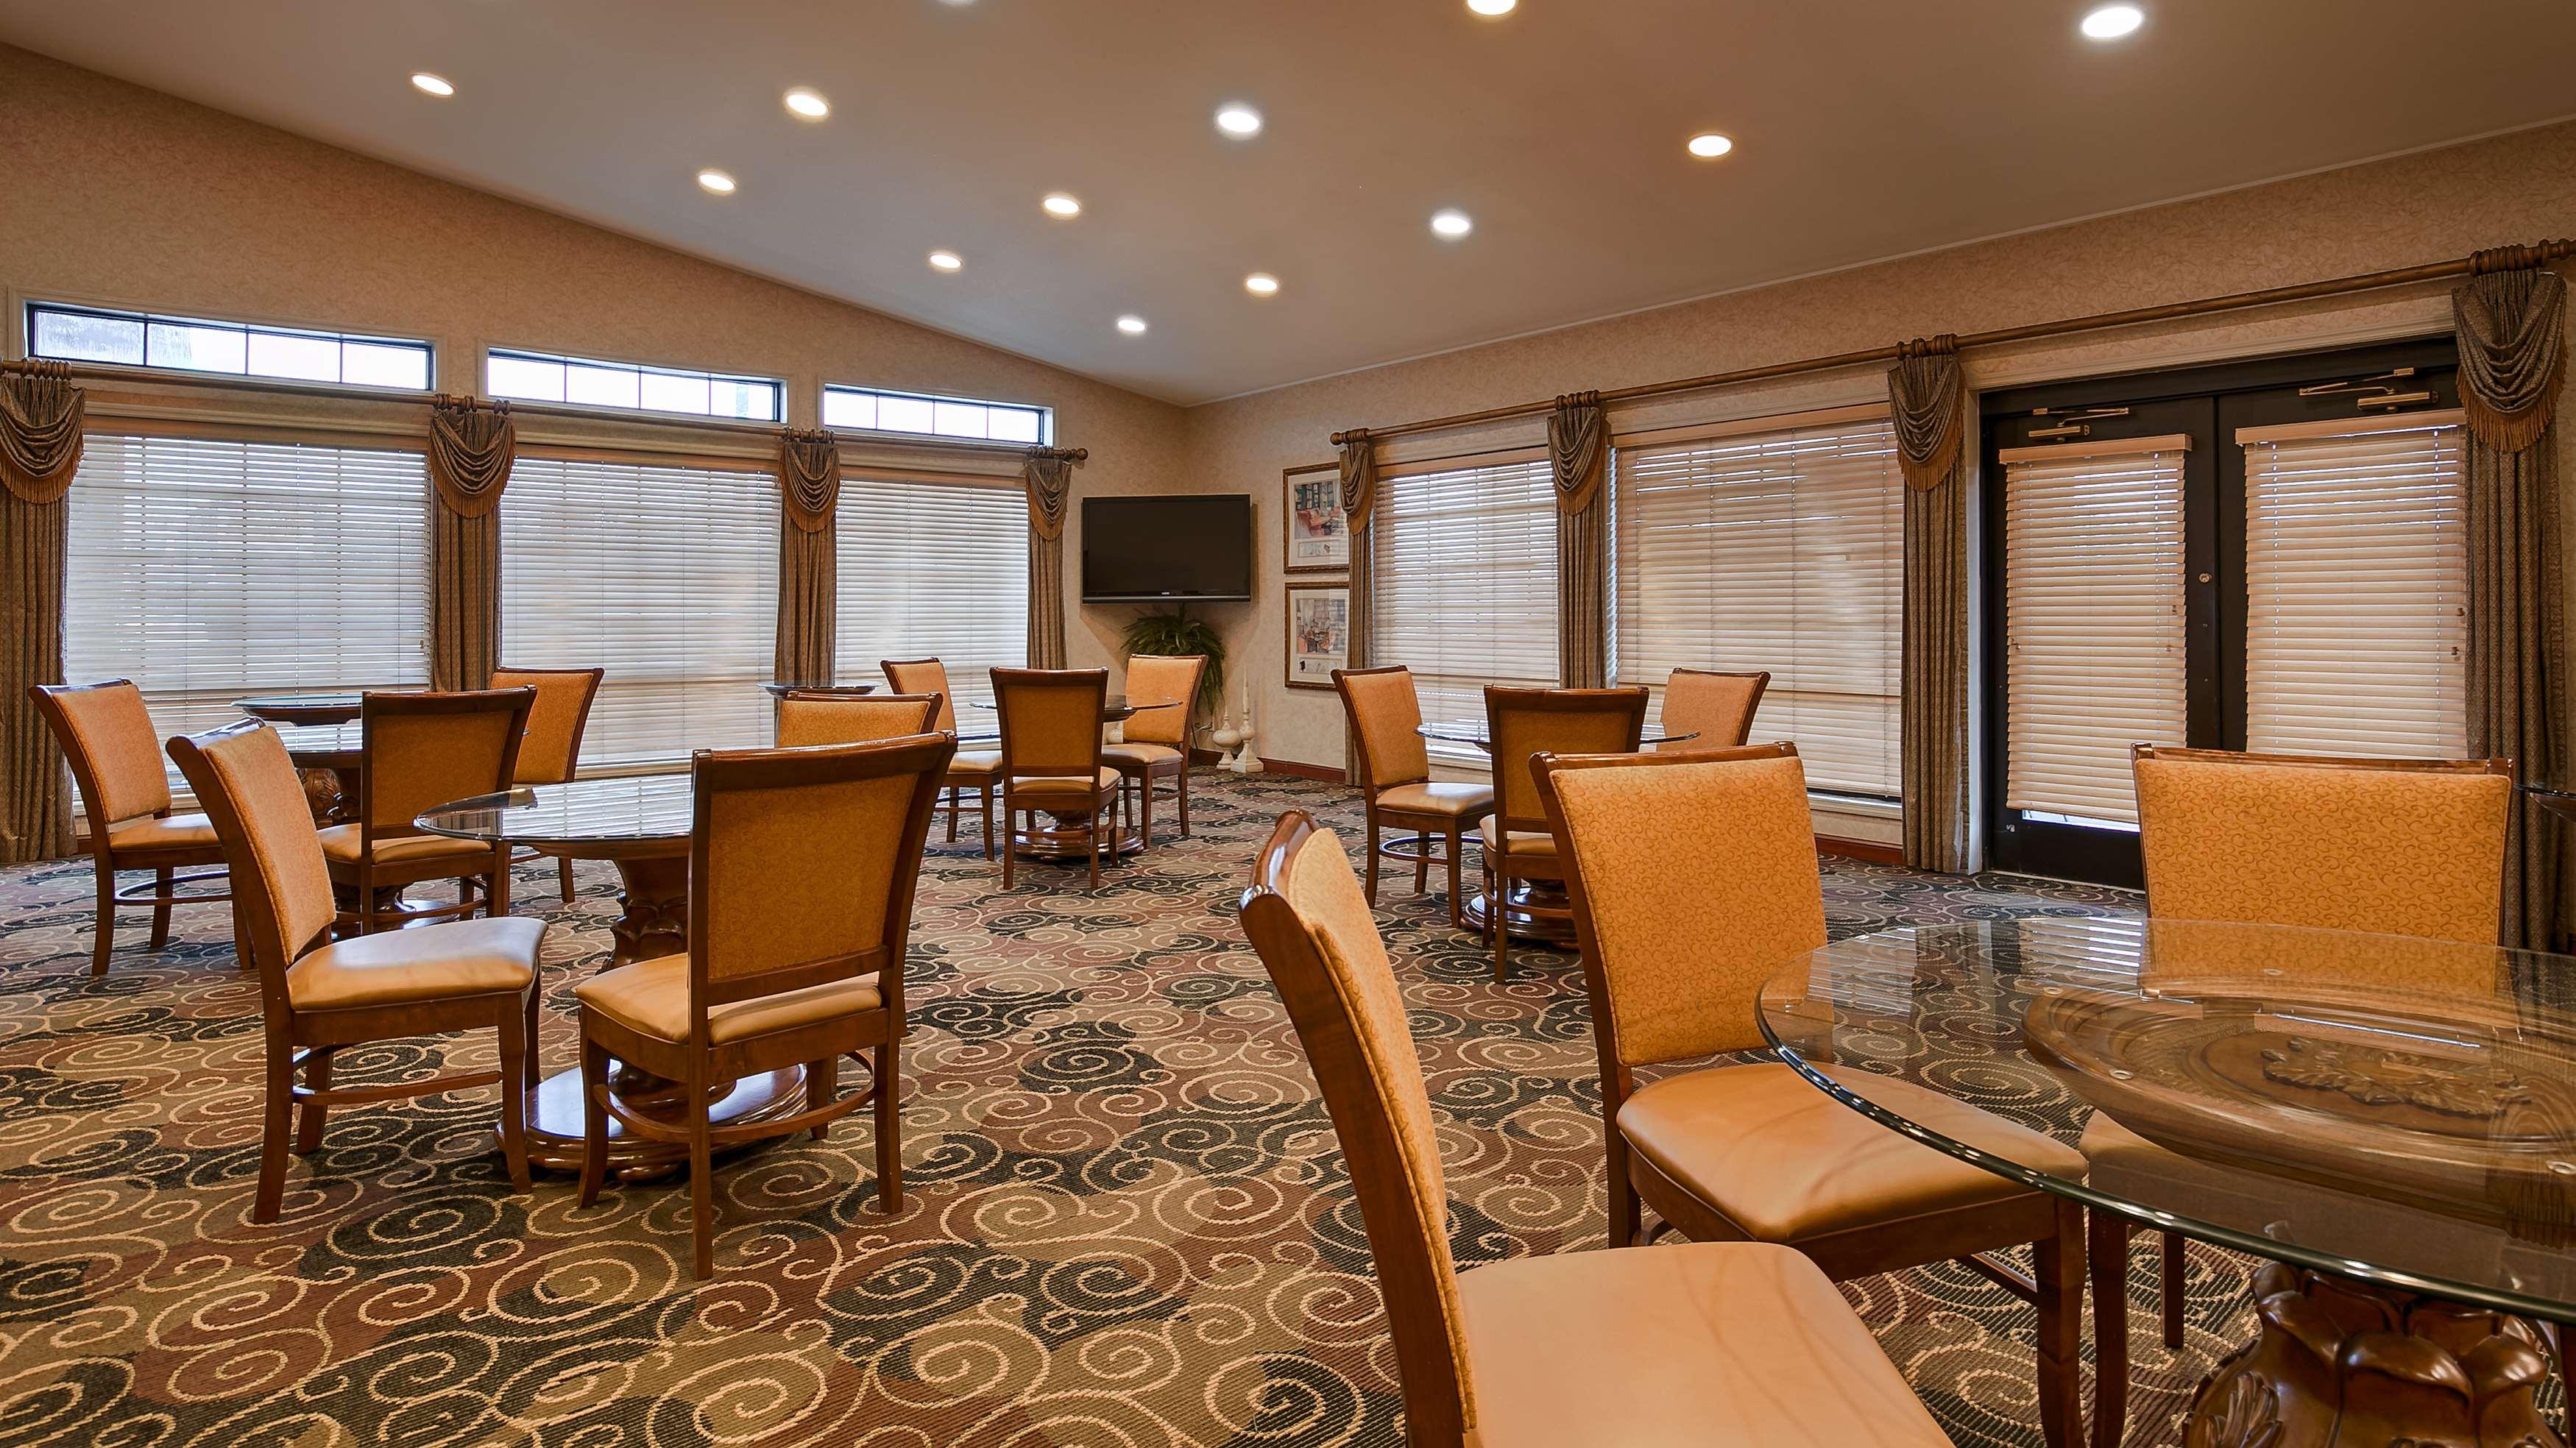 Best Western Plus Bessemer Hotel & Suites image 36